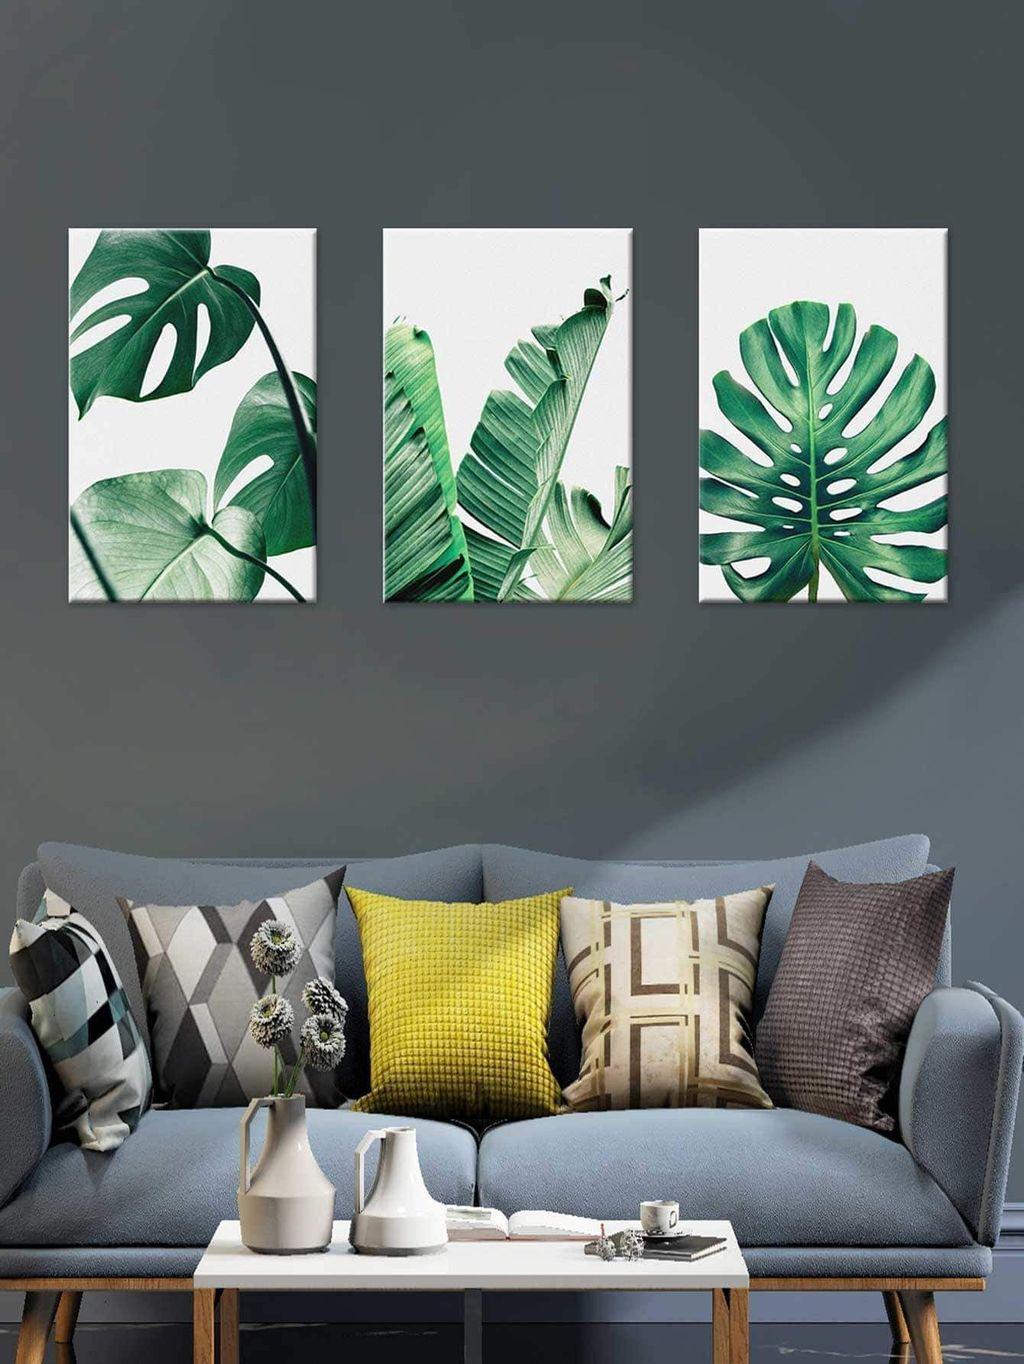 Splendid Tropical Leaf Decor Ideas For Home Design 03